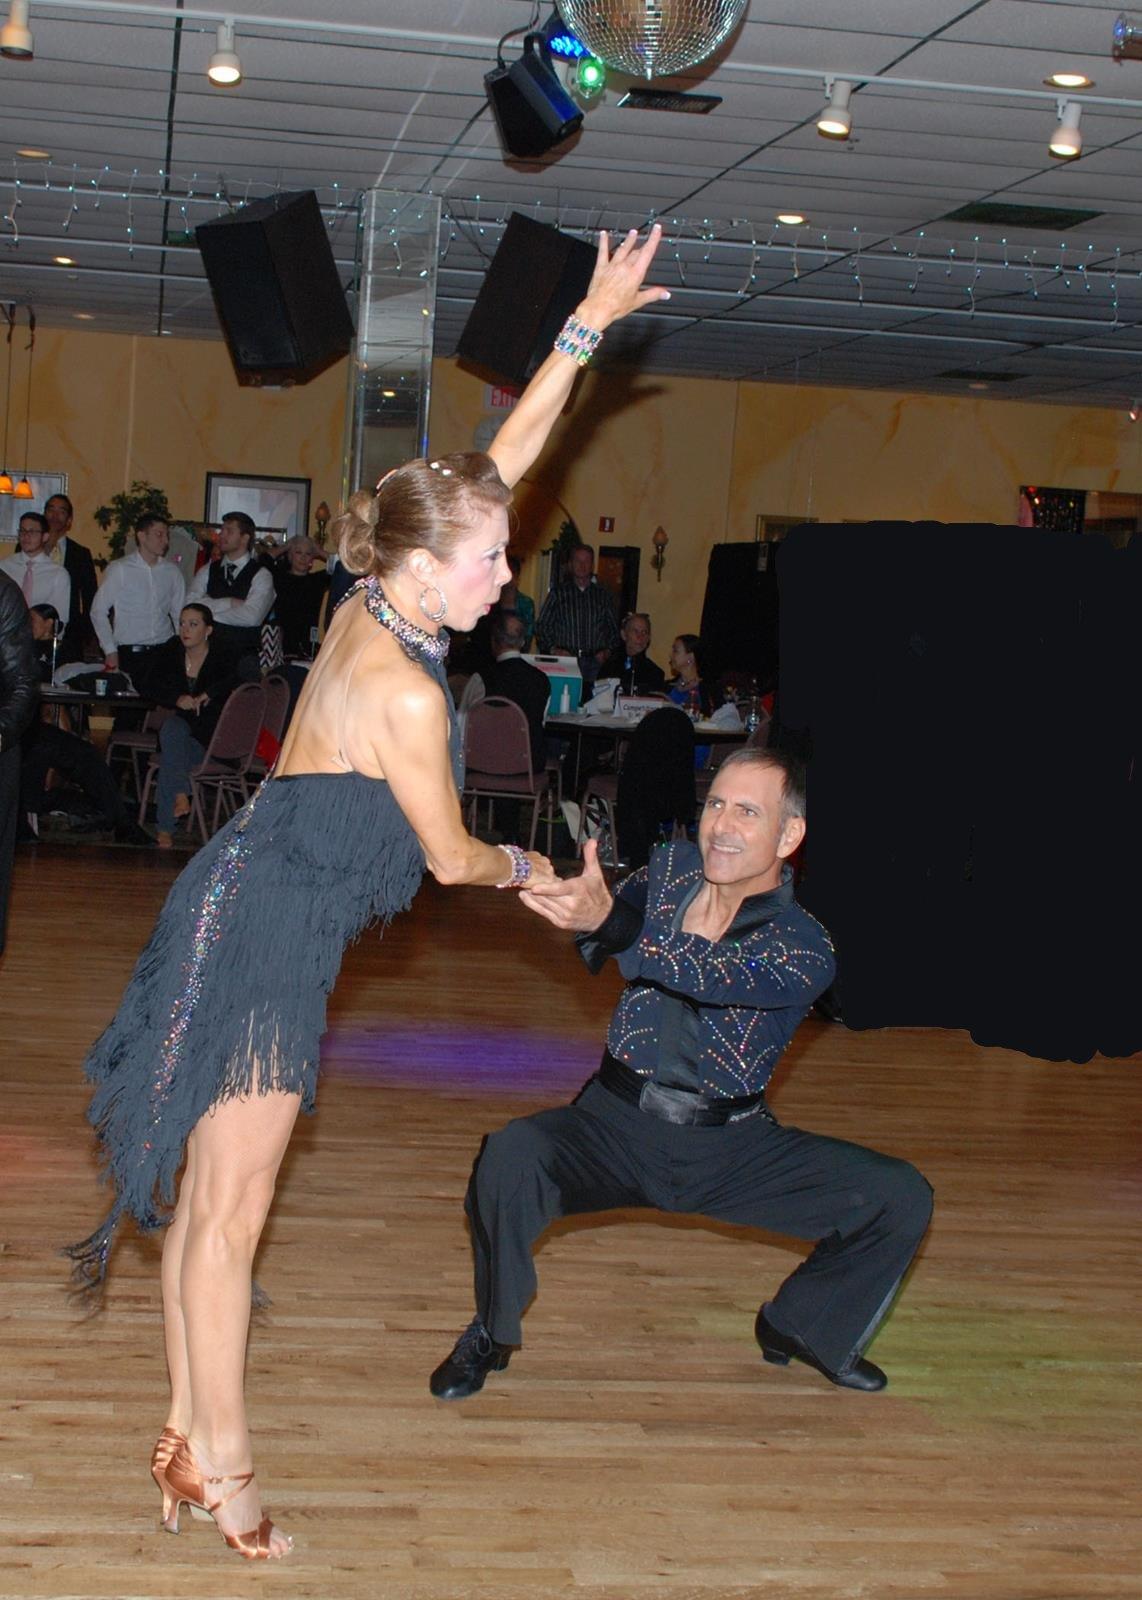 Daniel Fugazzotto & Janis Merluzzo - American Rhythm Champions